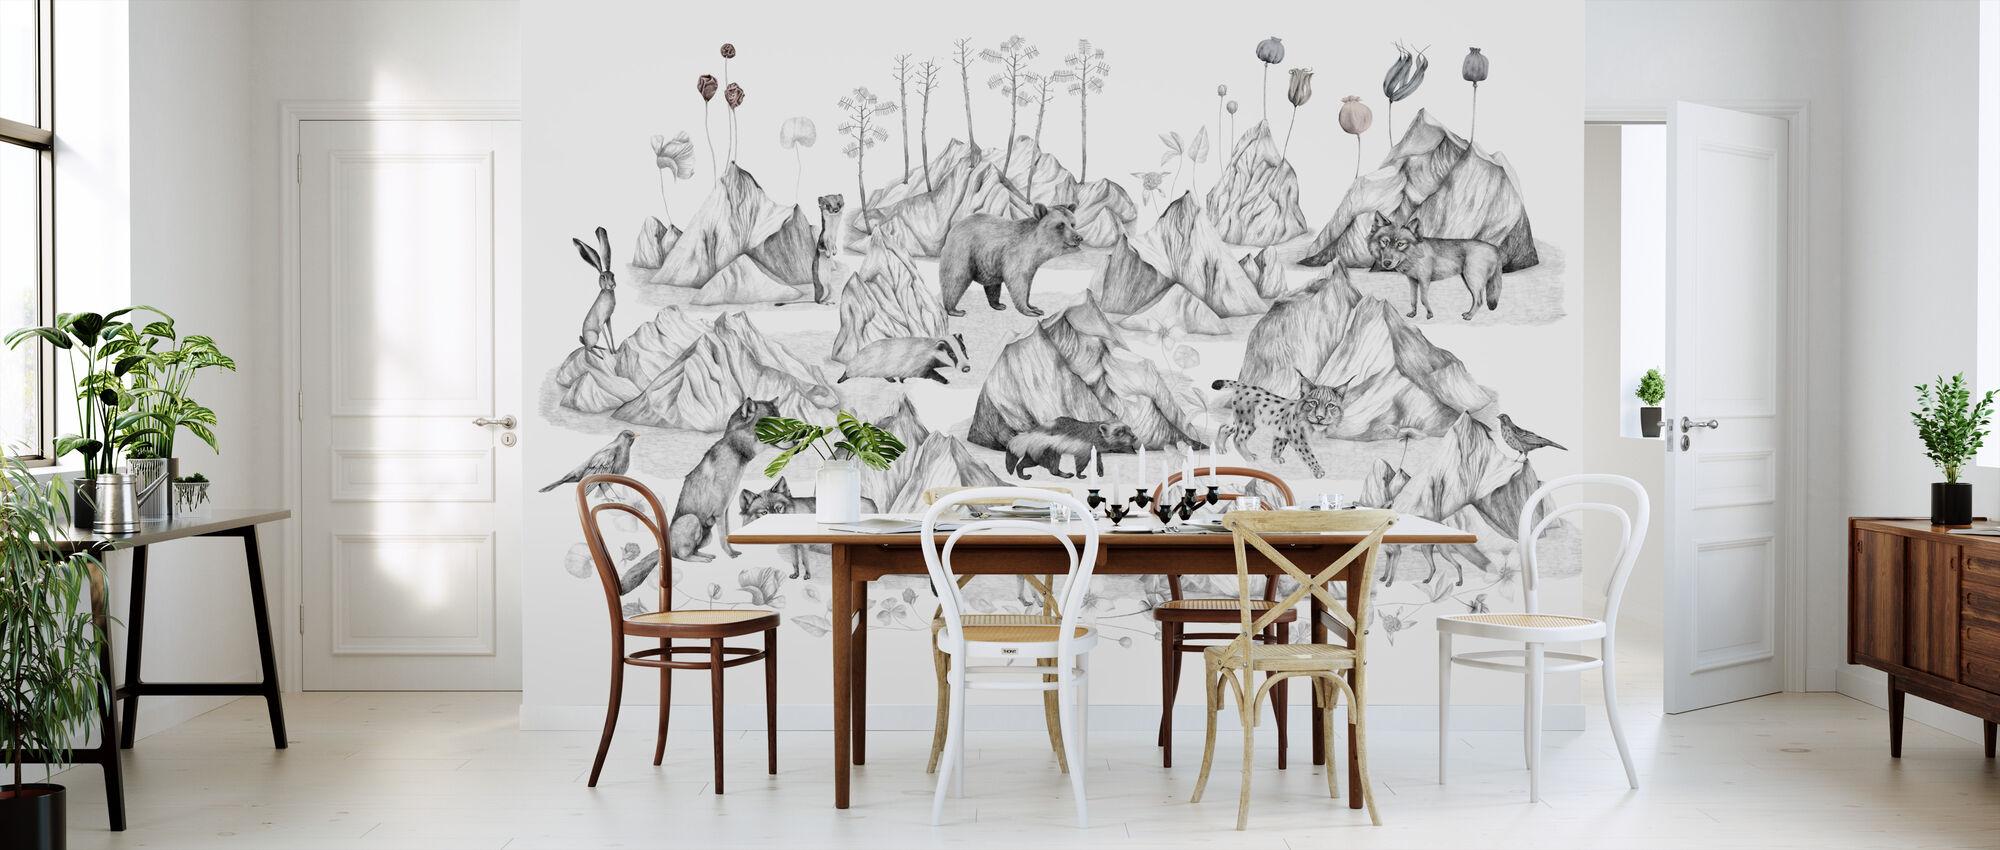 Free in My Landscape - Wallpaper - Kitchen